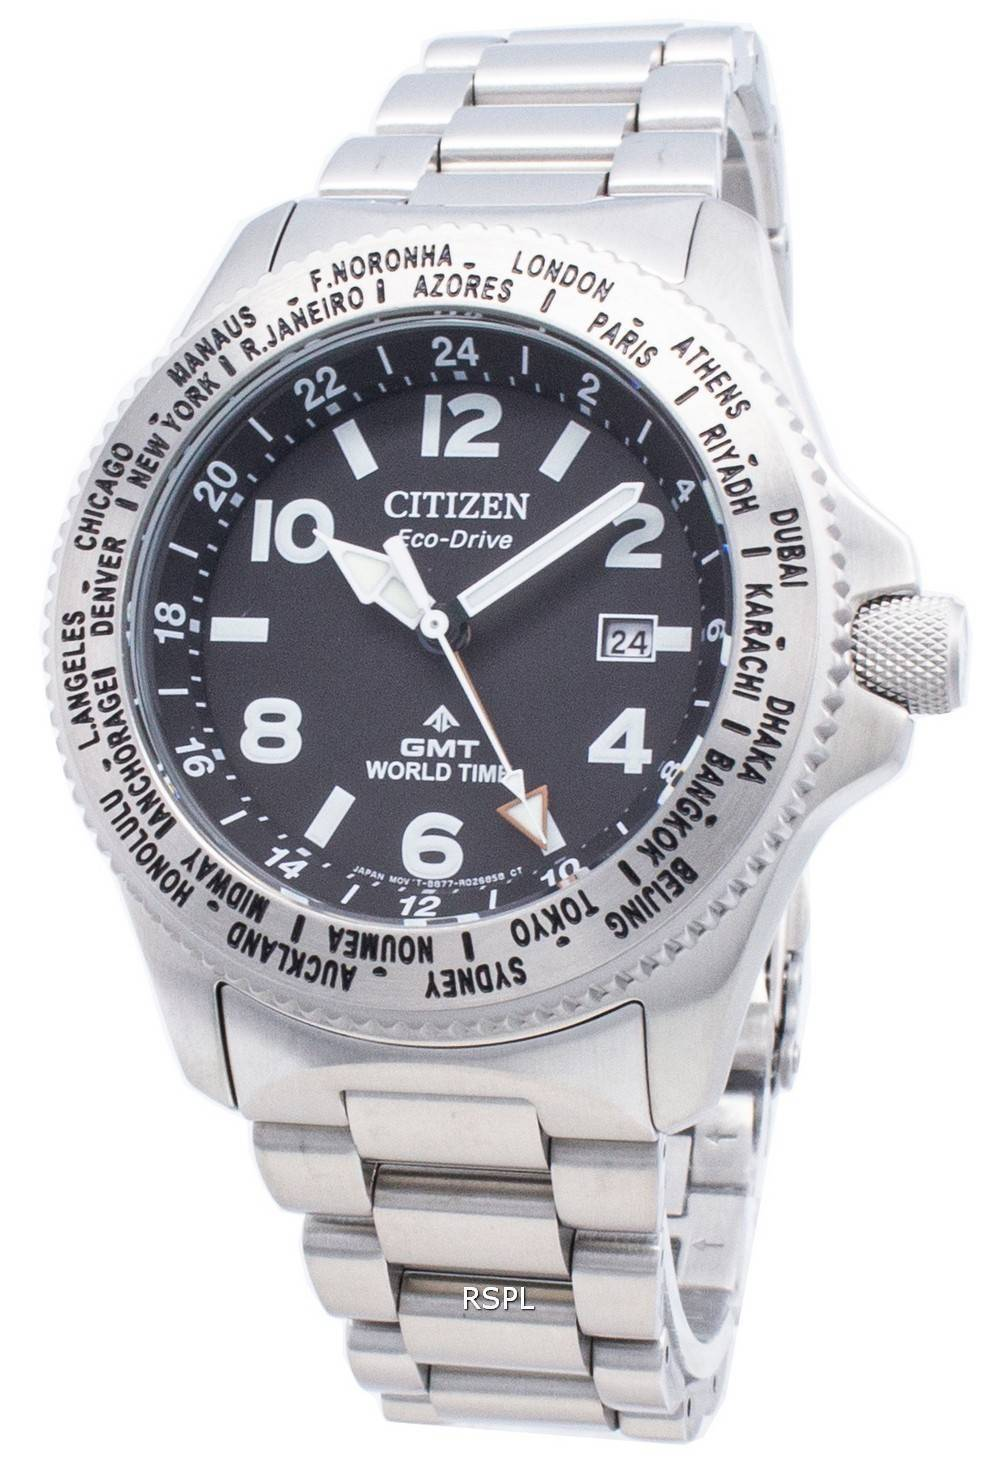 Citizen PROMASTER Eco-Drive BJ7100-82E maailmanaikainen 200M miesten kello